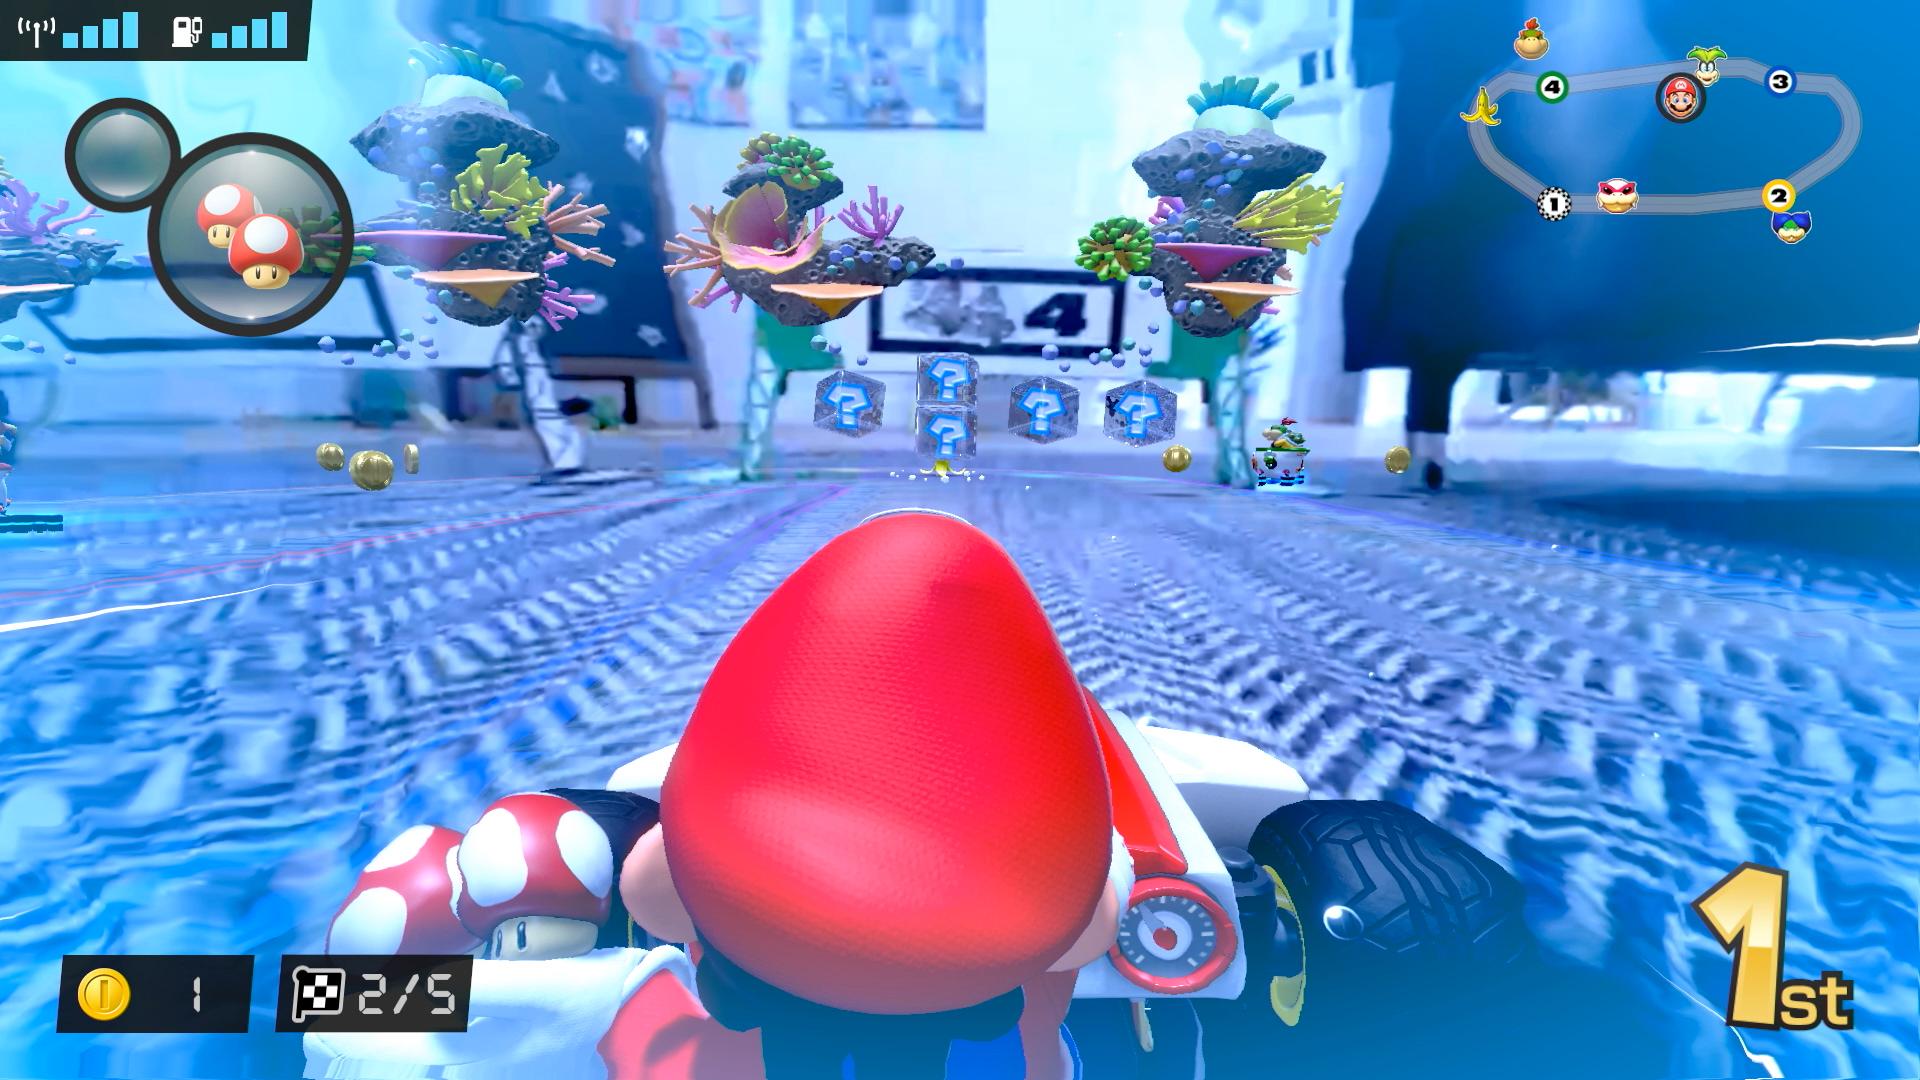 Mario Kart Live: Home Circuit underwater